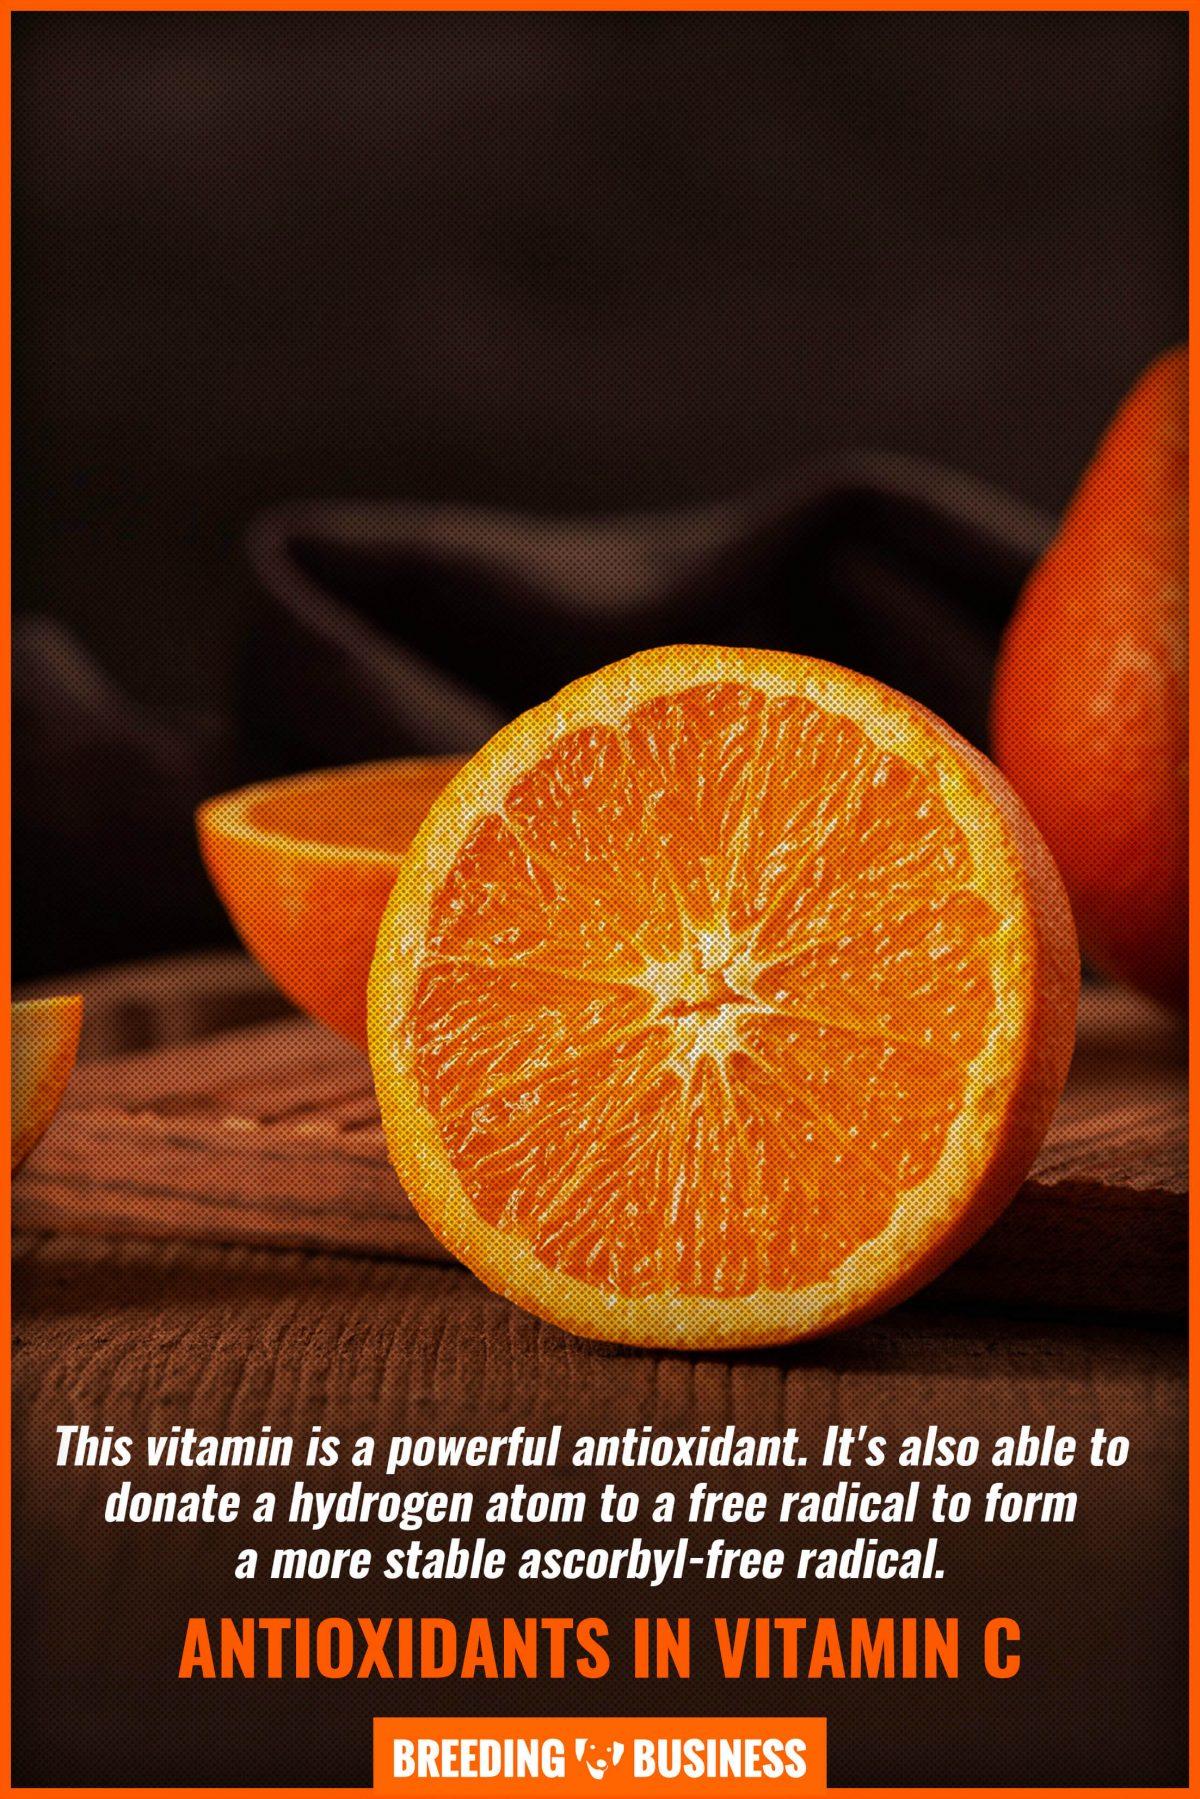 antioxidants in vitamin c